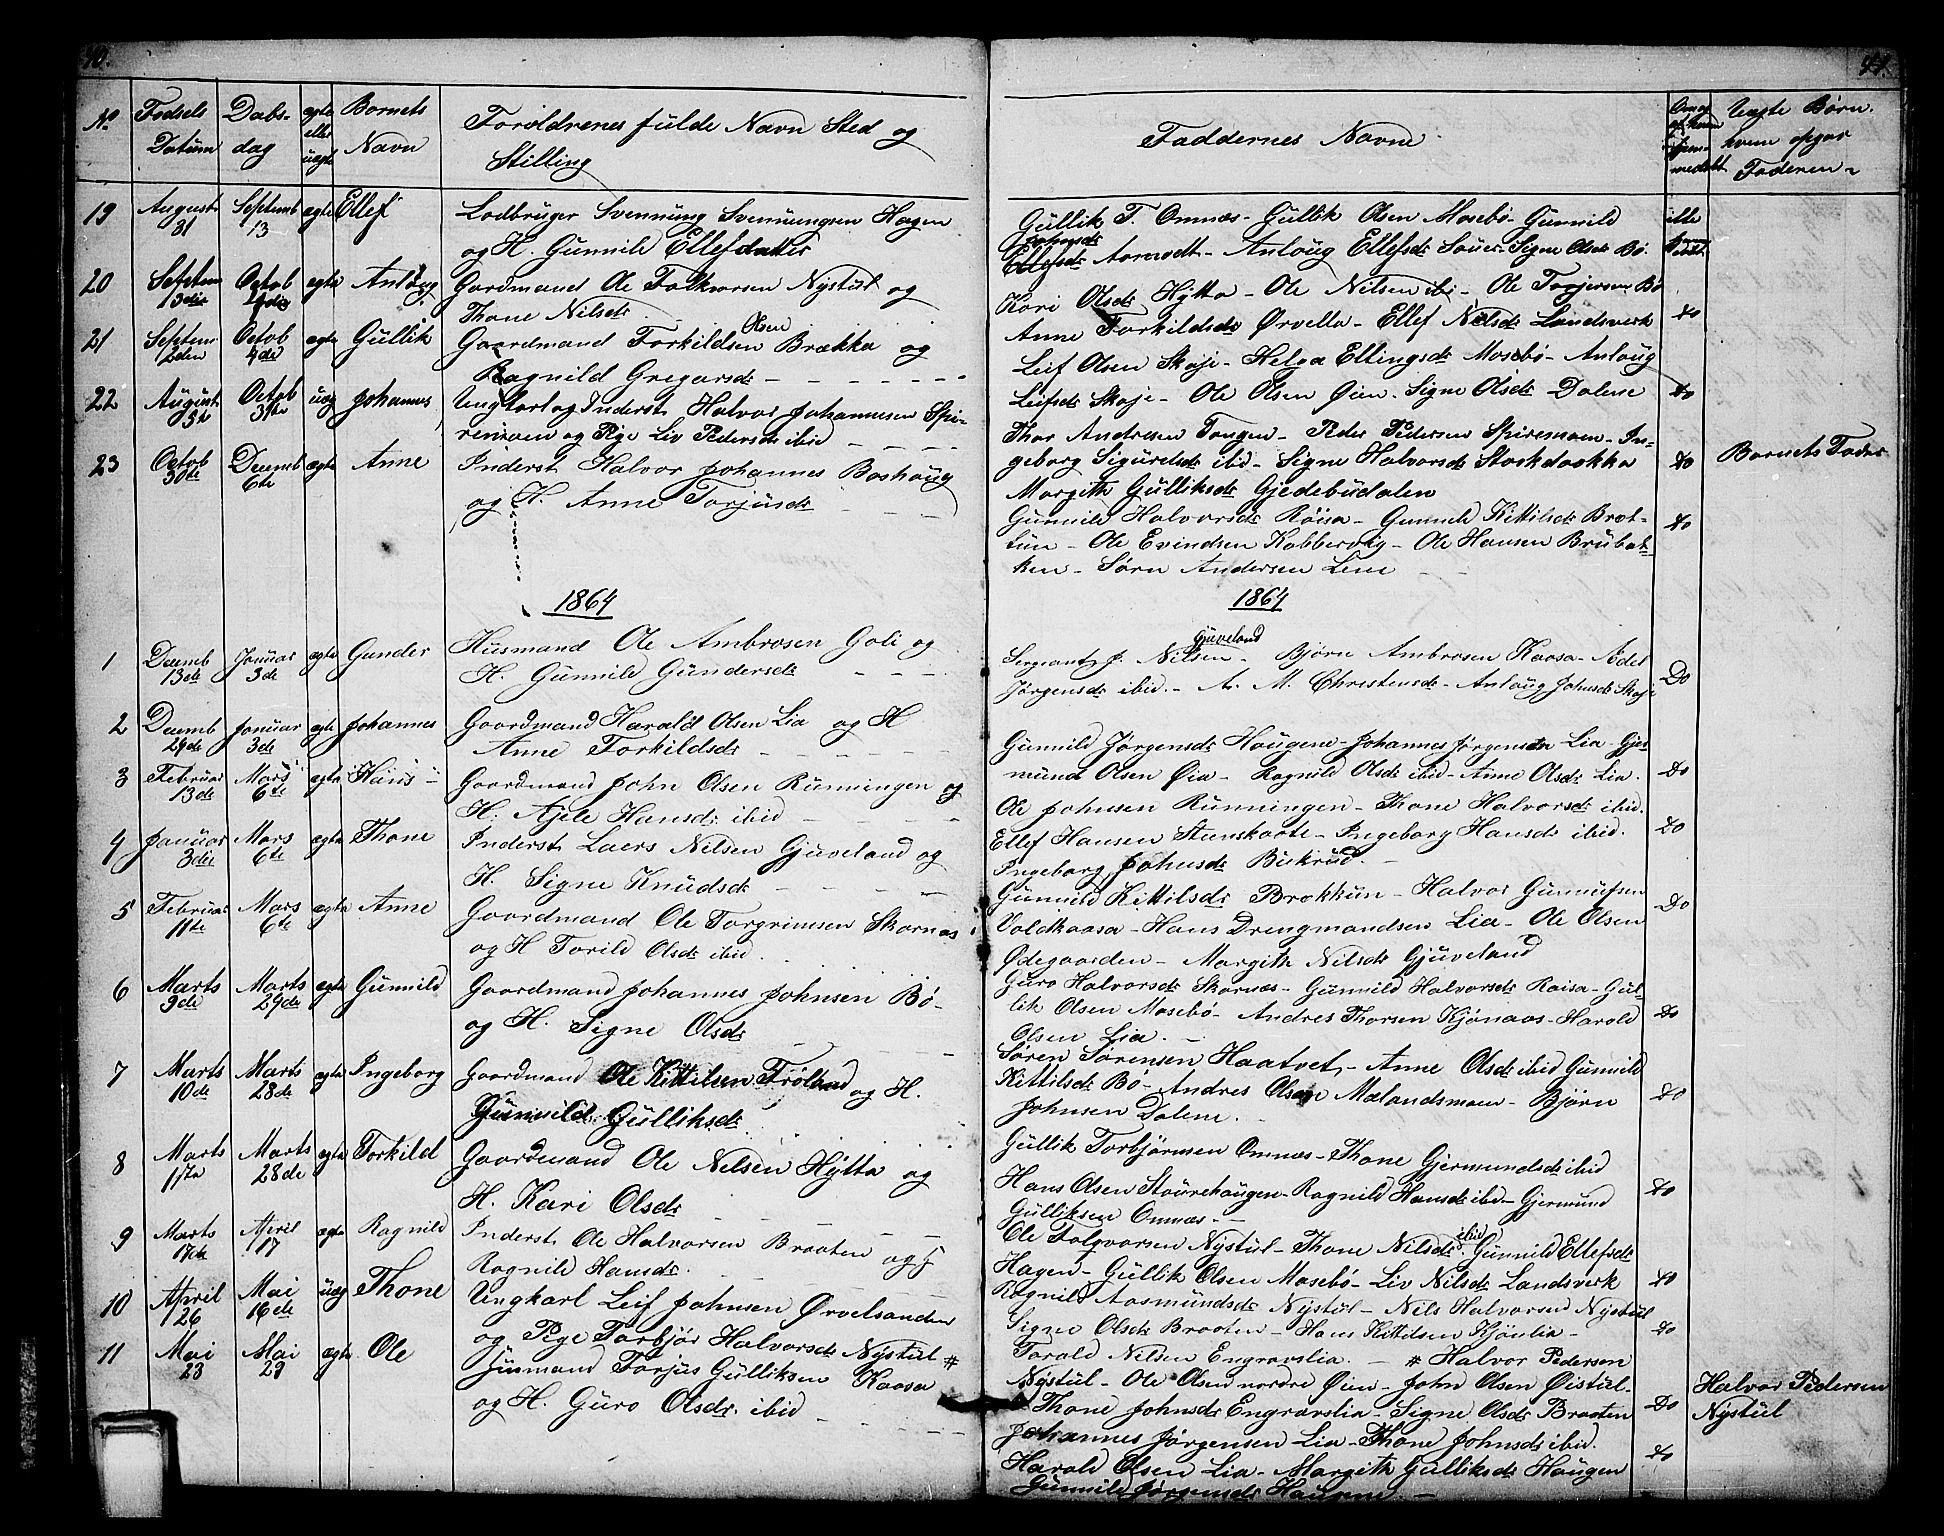 SAKO, Hjartdal kirkebøker, G/Gb/L0002: Klokkerbok nr. II 2, 1854-1884, s. 40-41